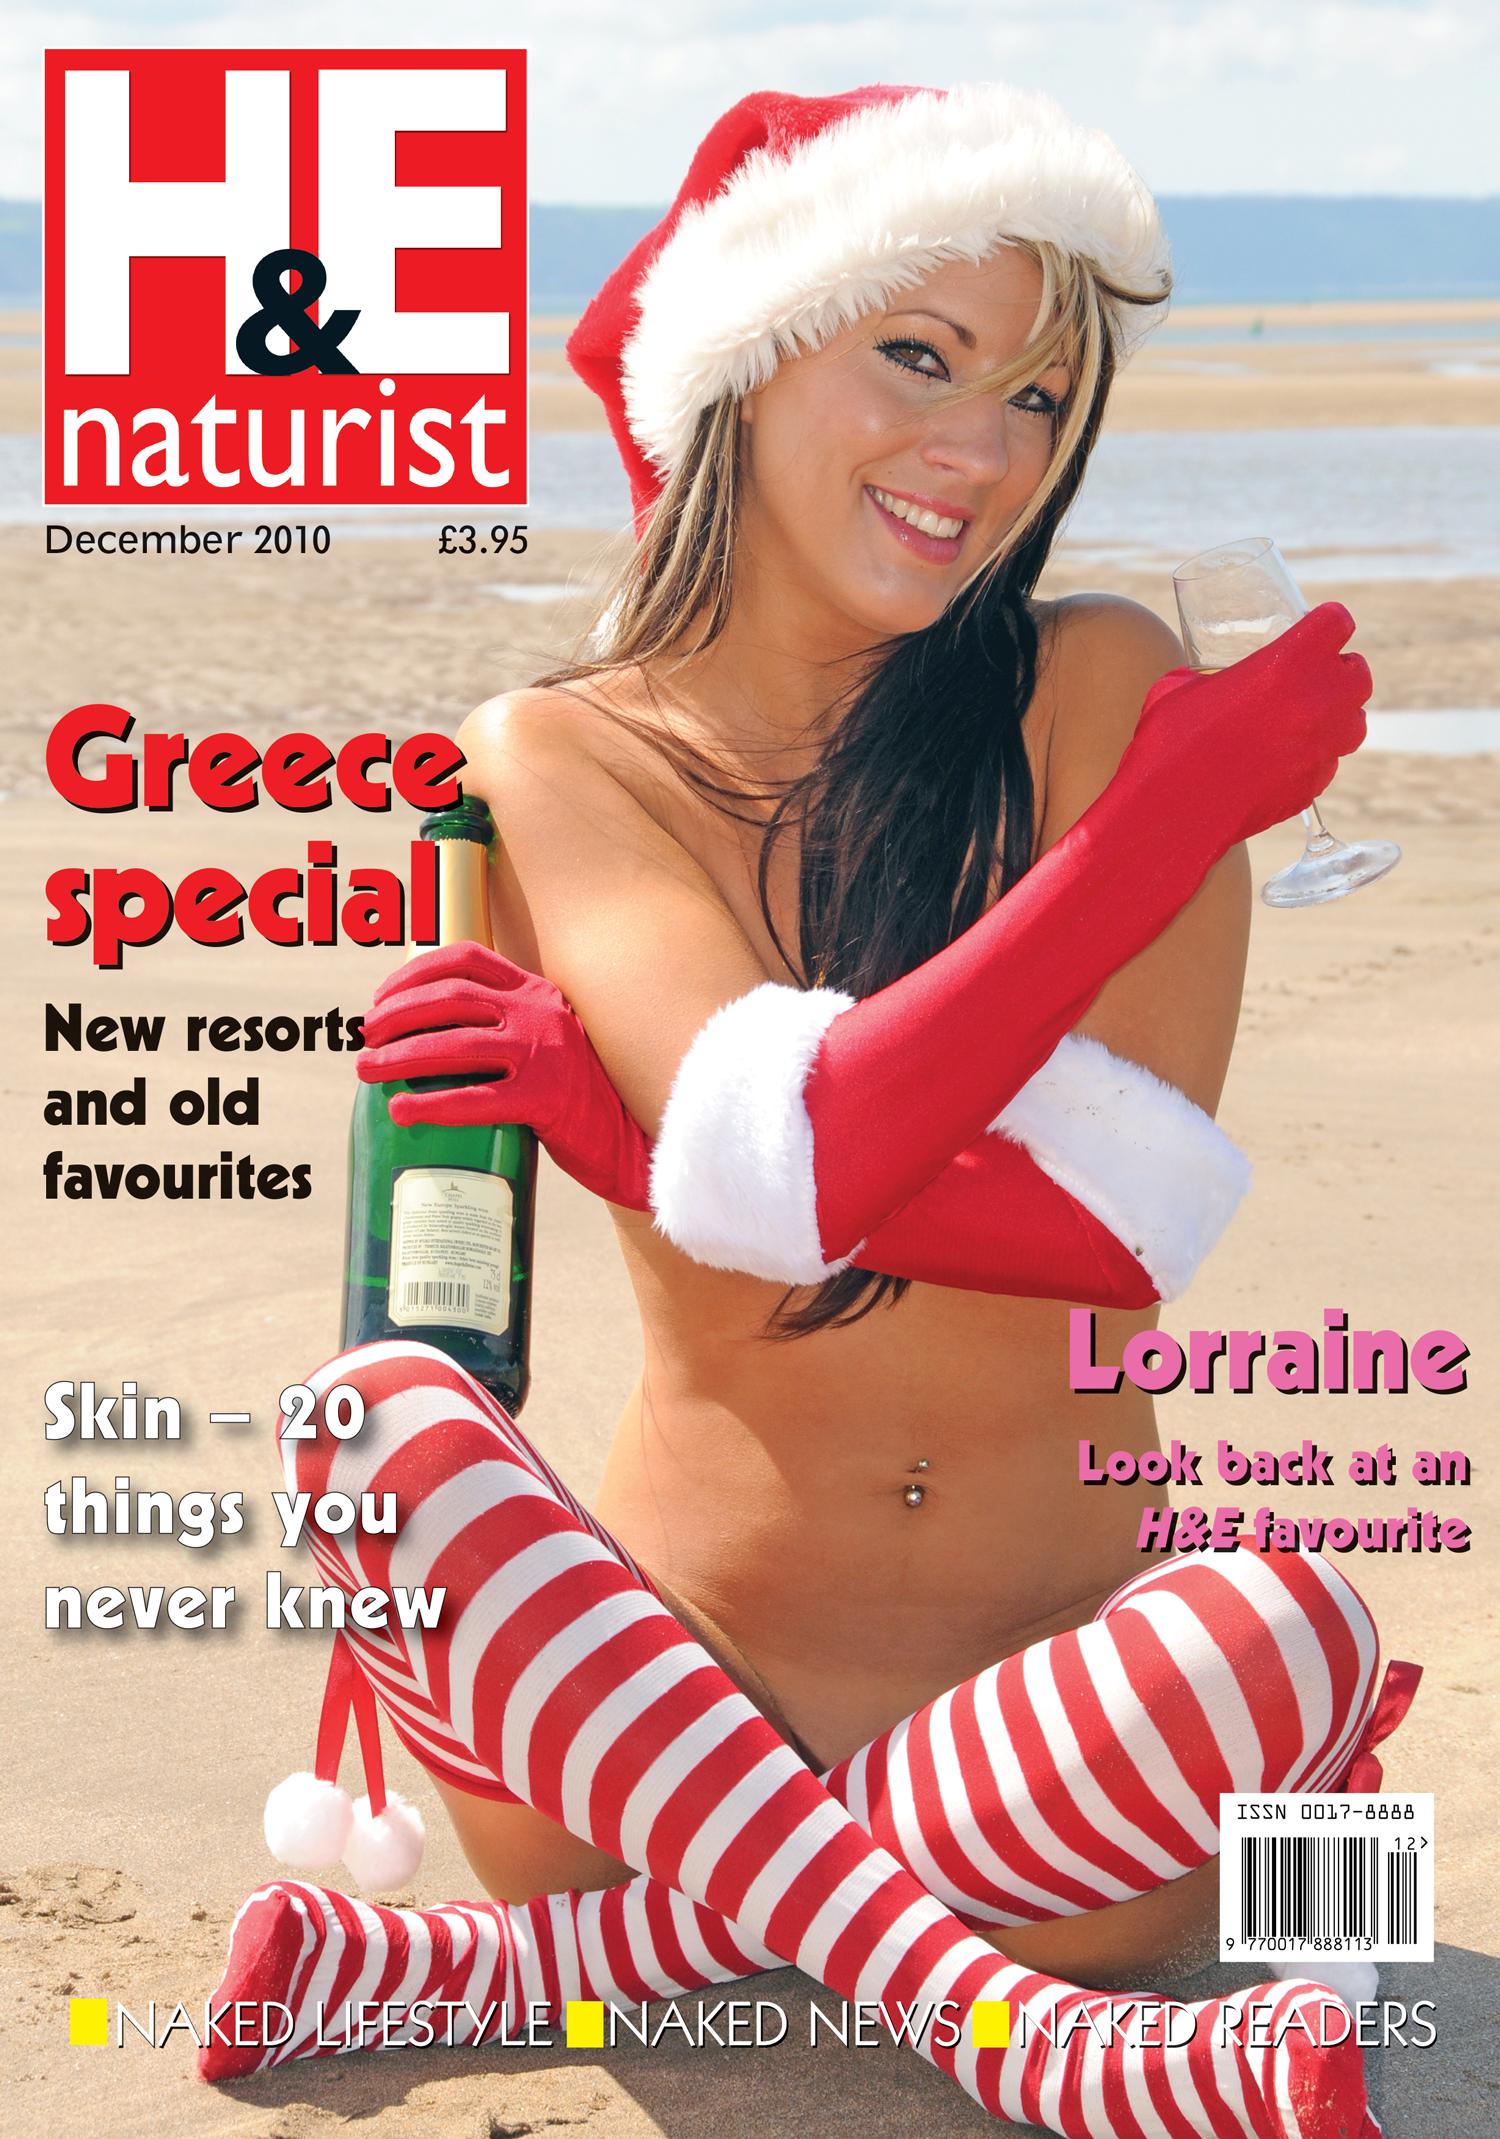 H&E naturist magazine December 2010 - H&E naturist magazine